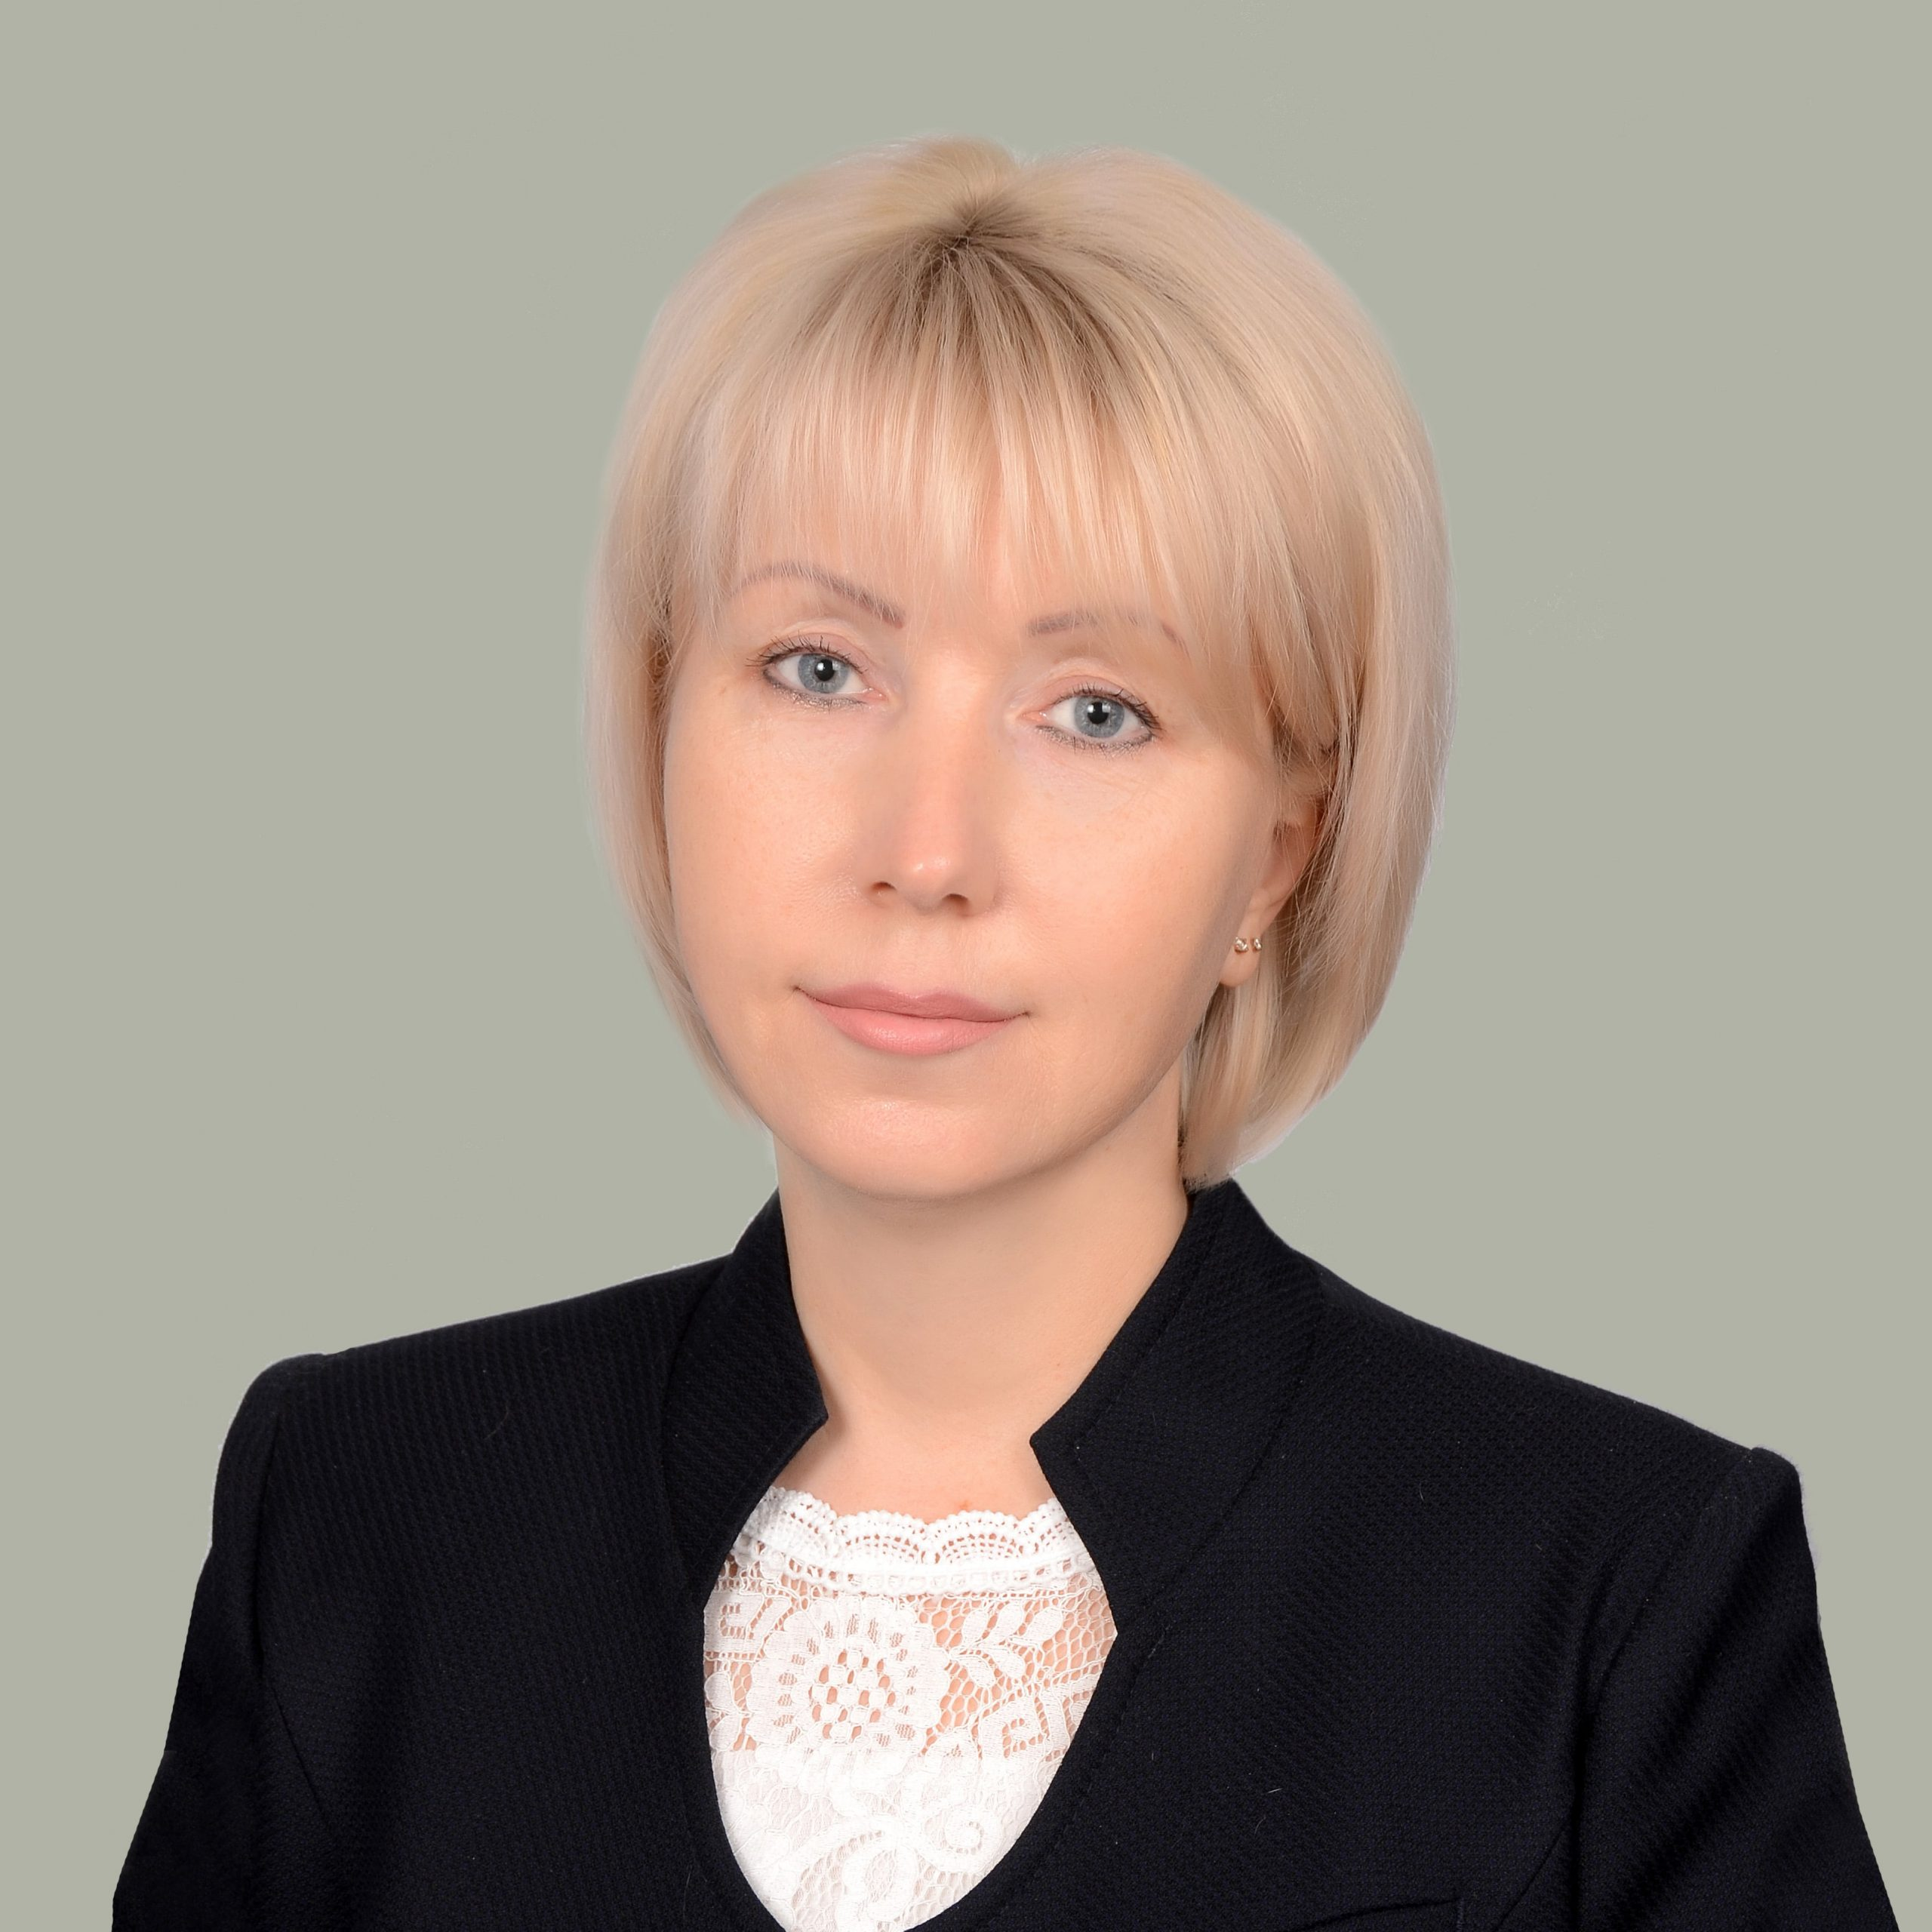 Негреева Елена Анатольевна